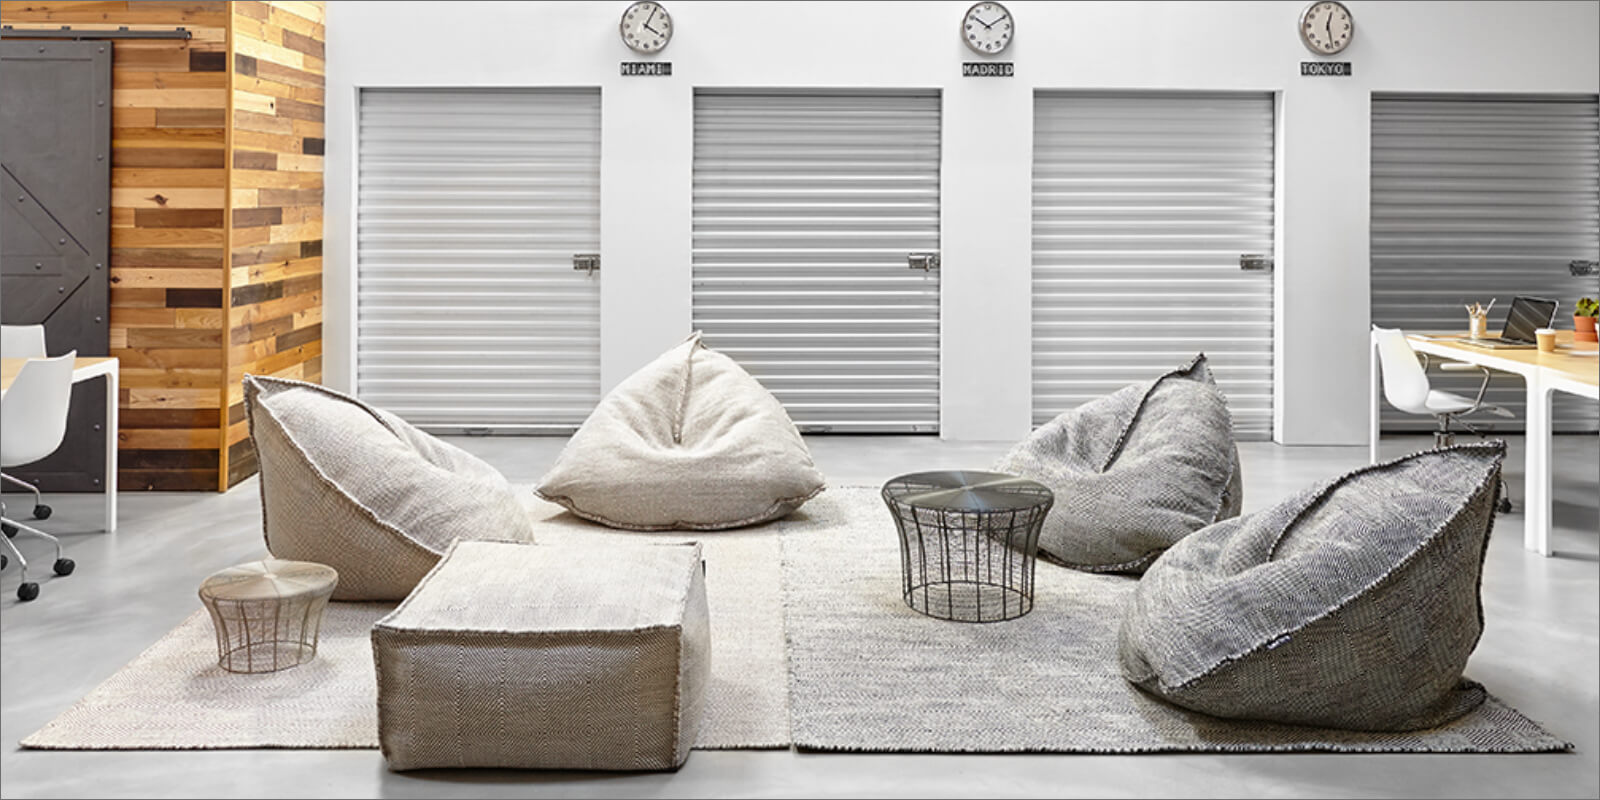 Tappeti moderni grigio chiaro